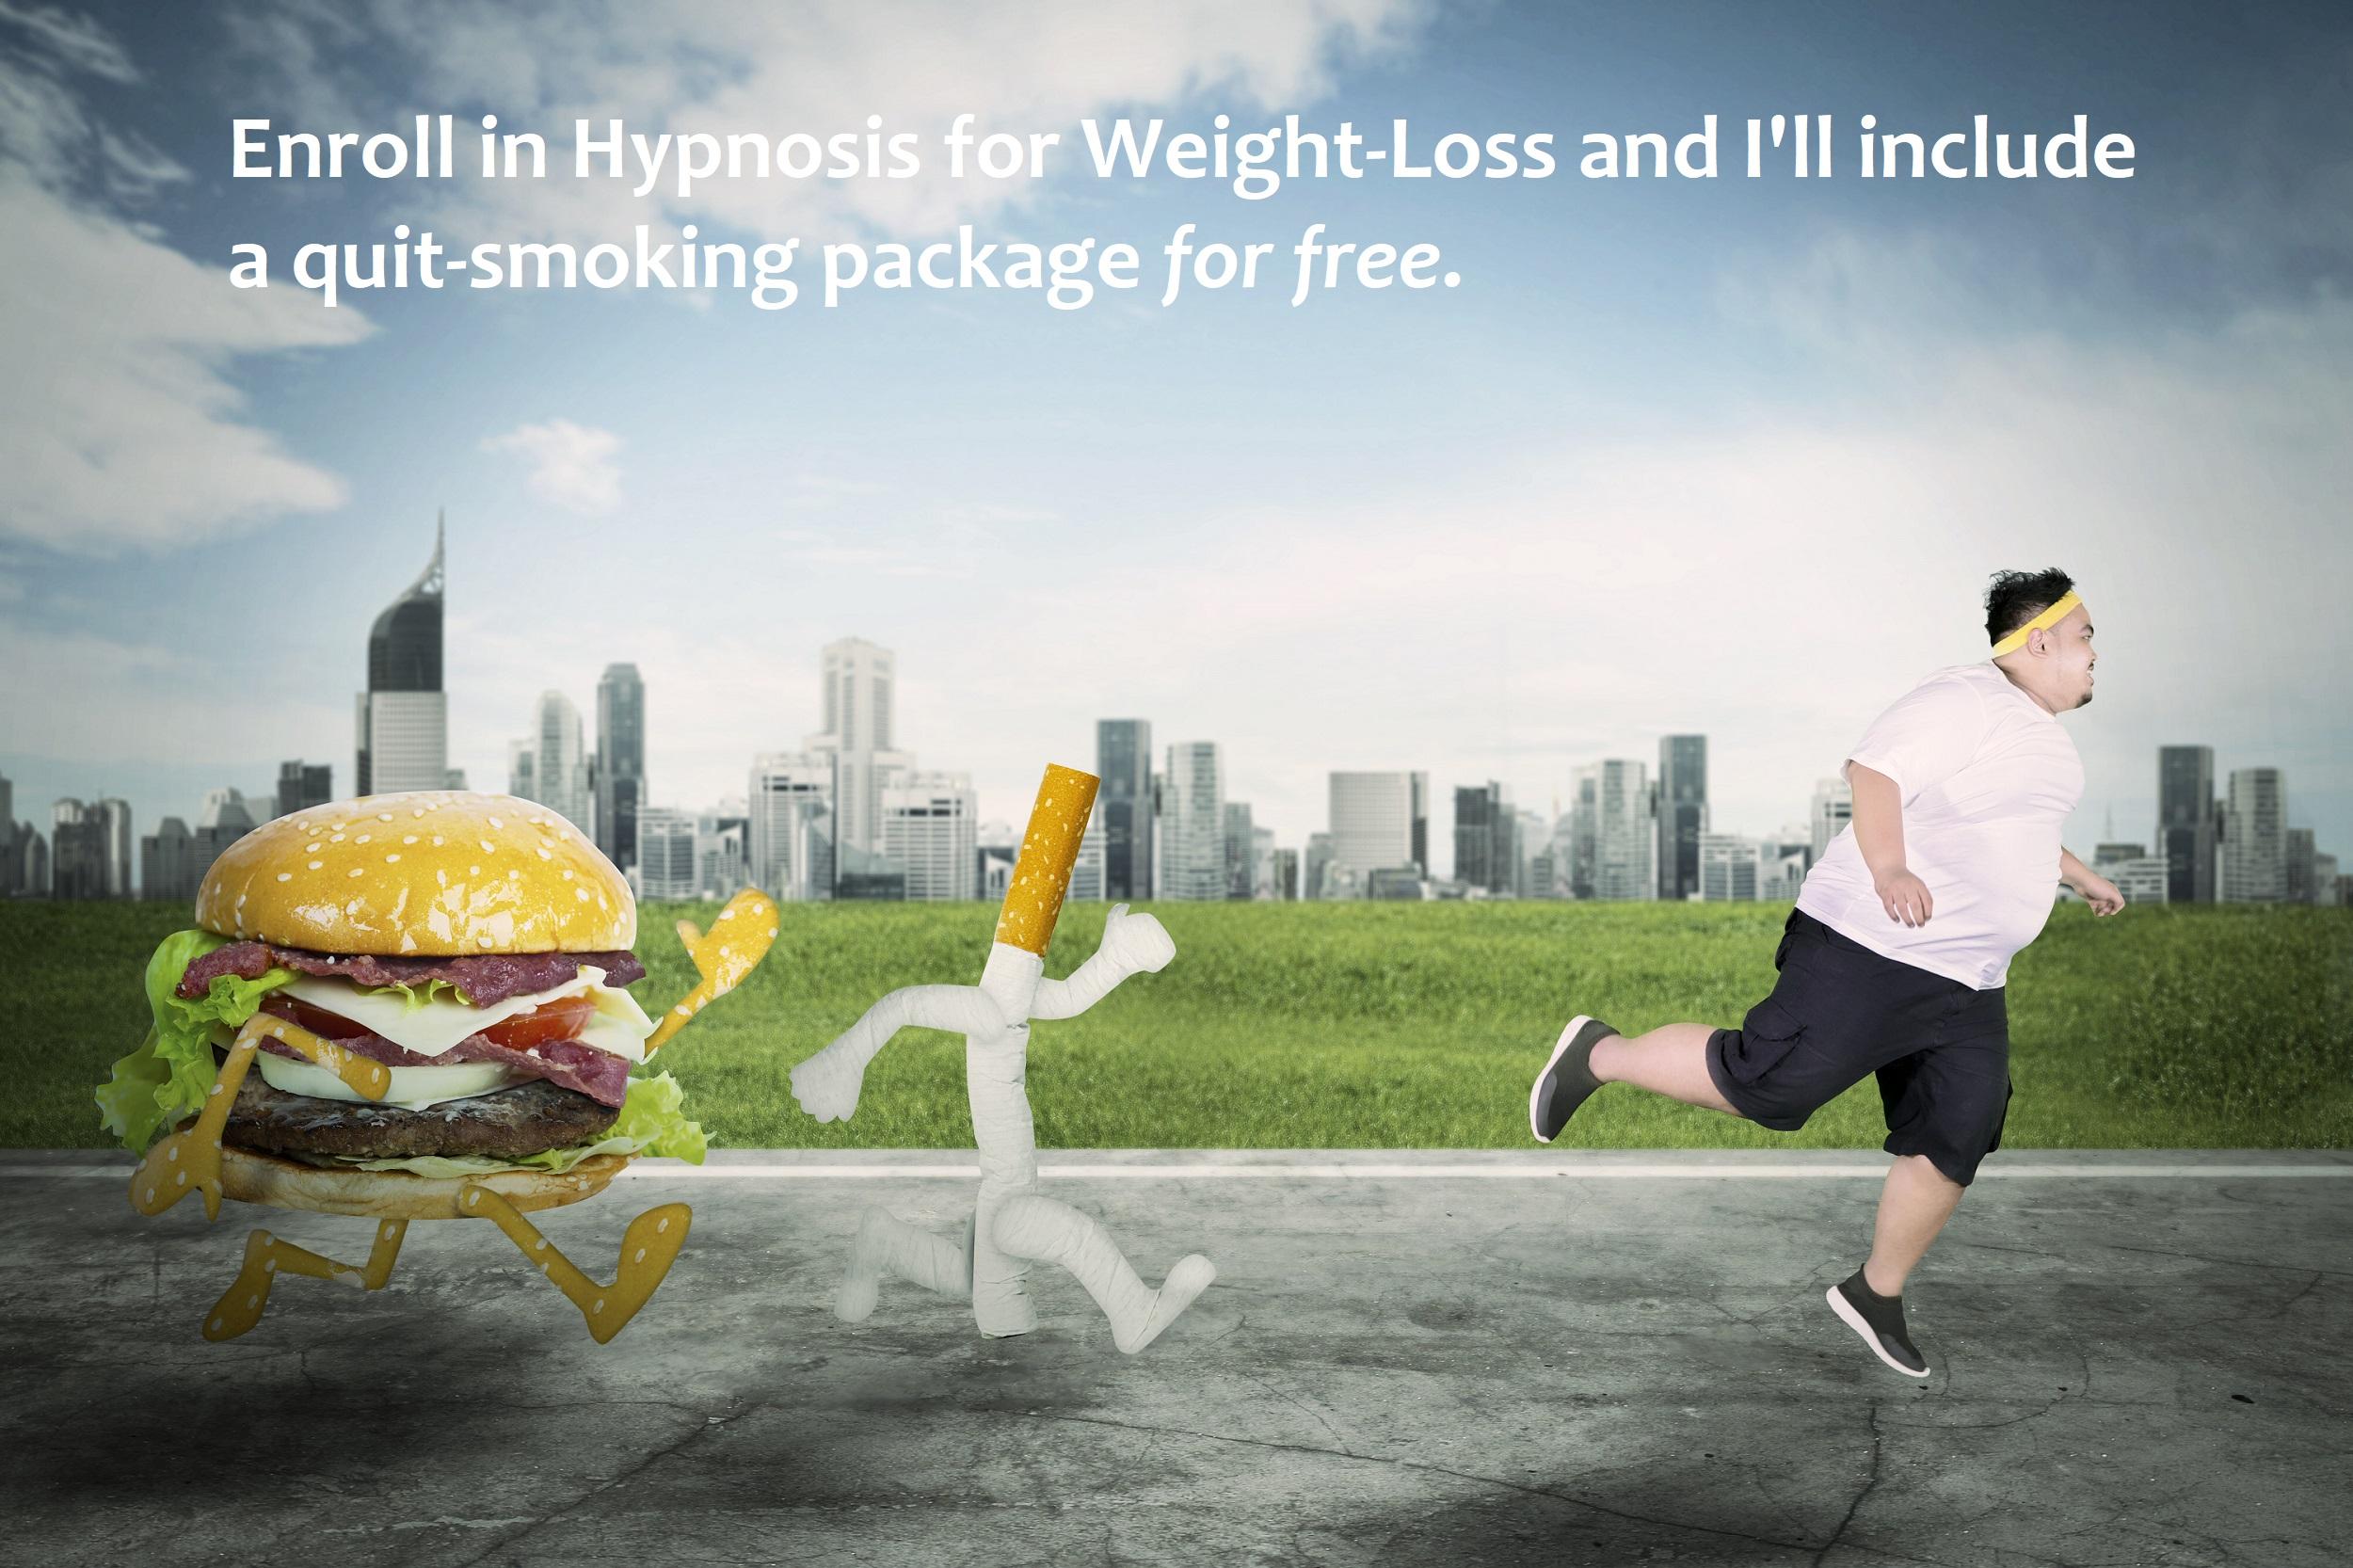 lose_weight_quit_smoking_hypnosis.jpg